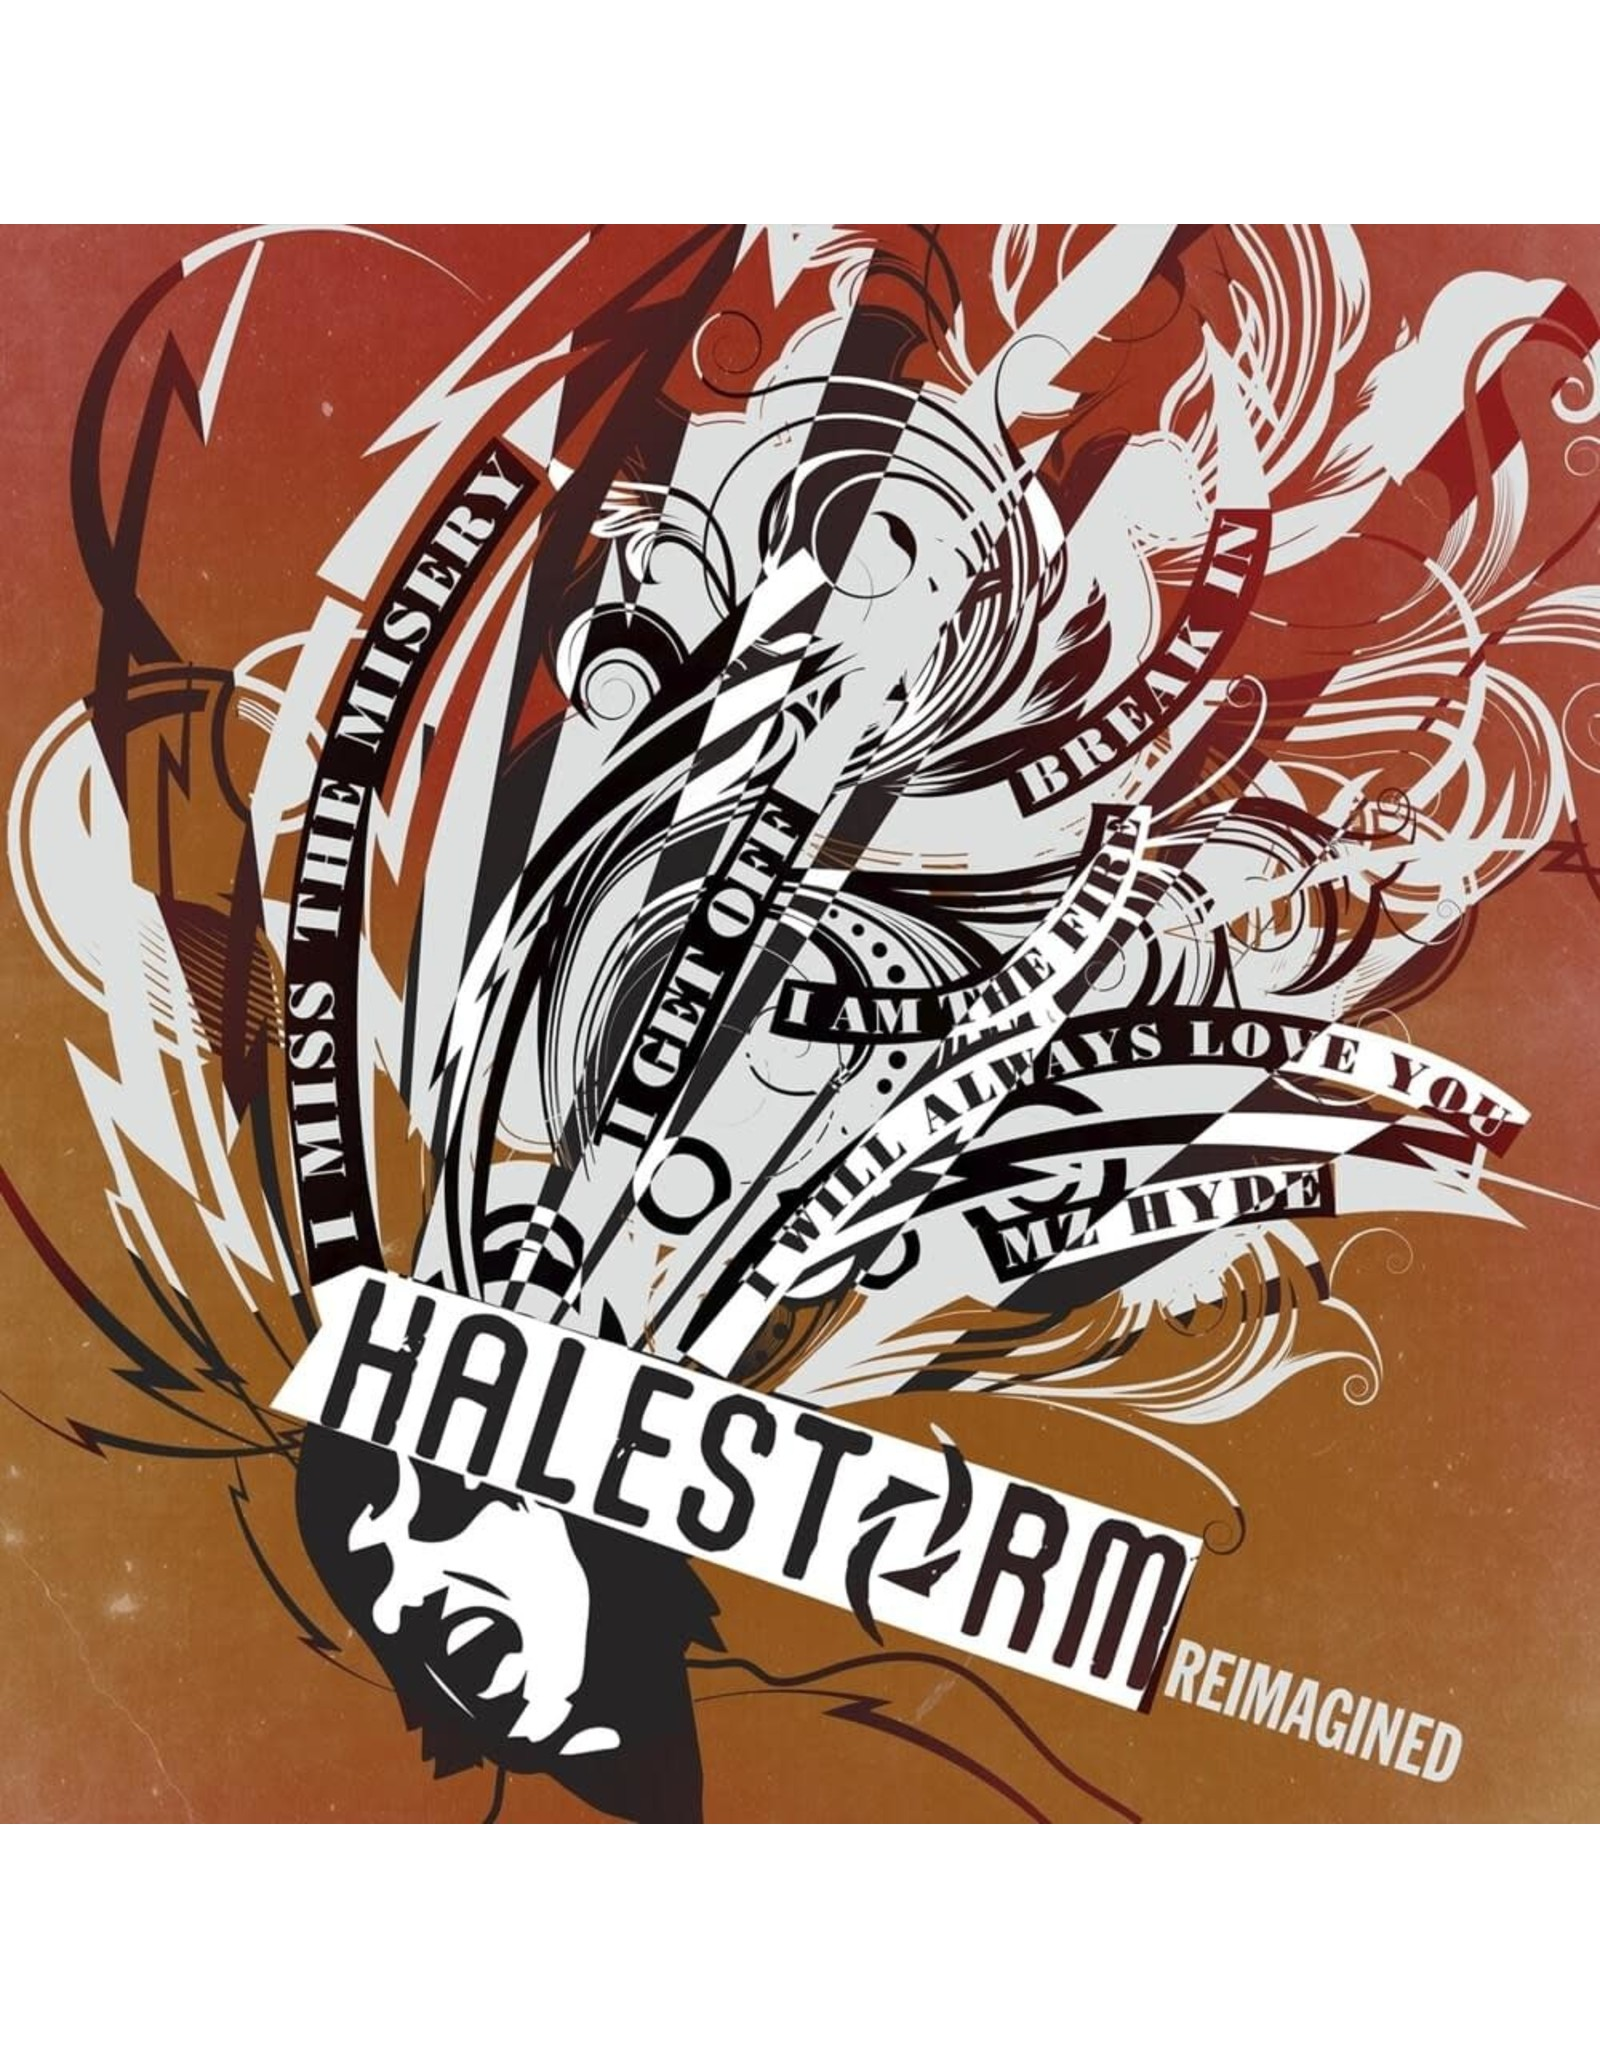 Halestorm - Remagined LP